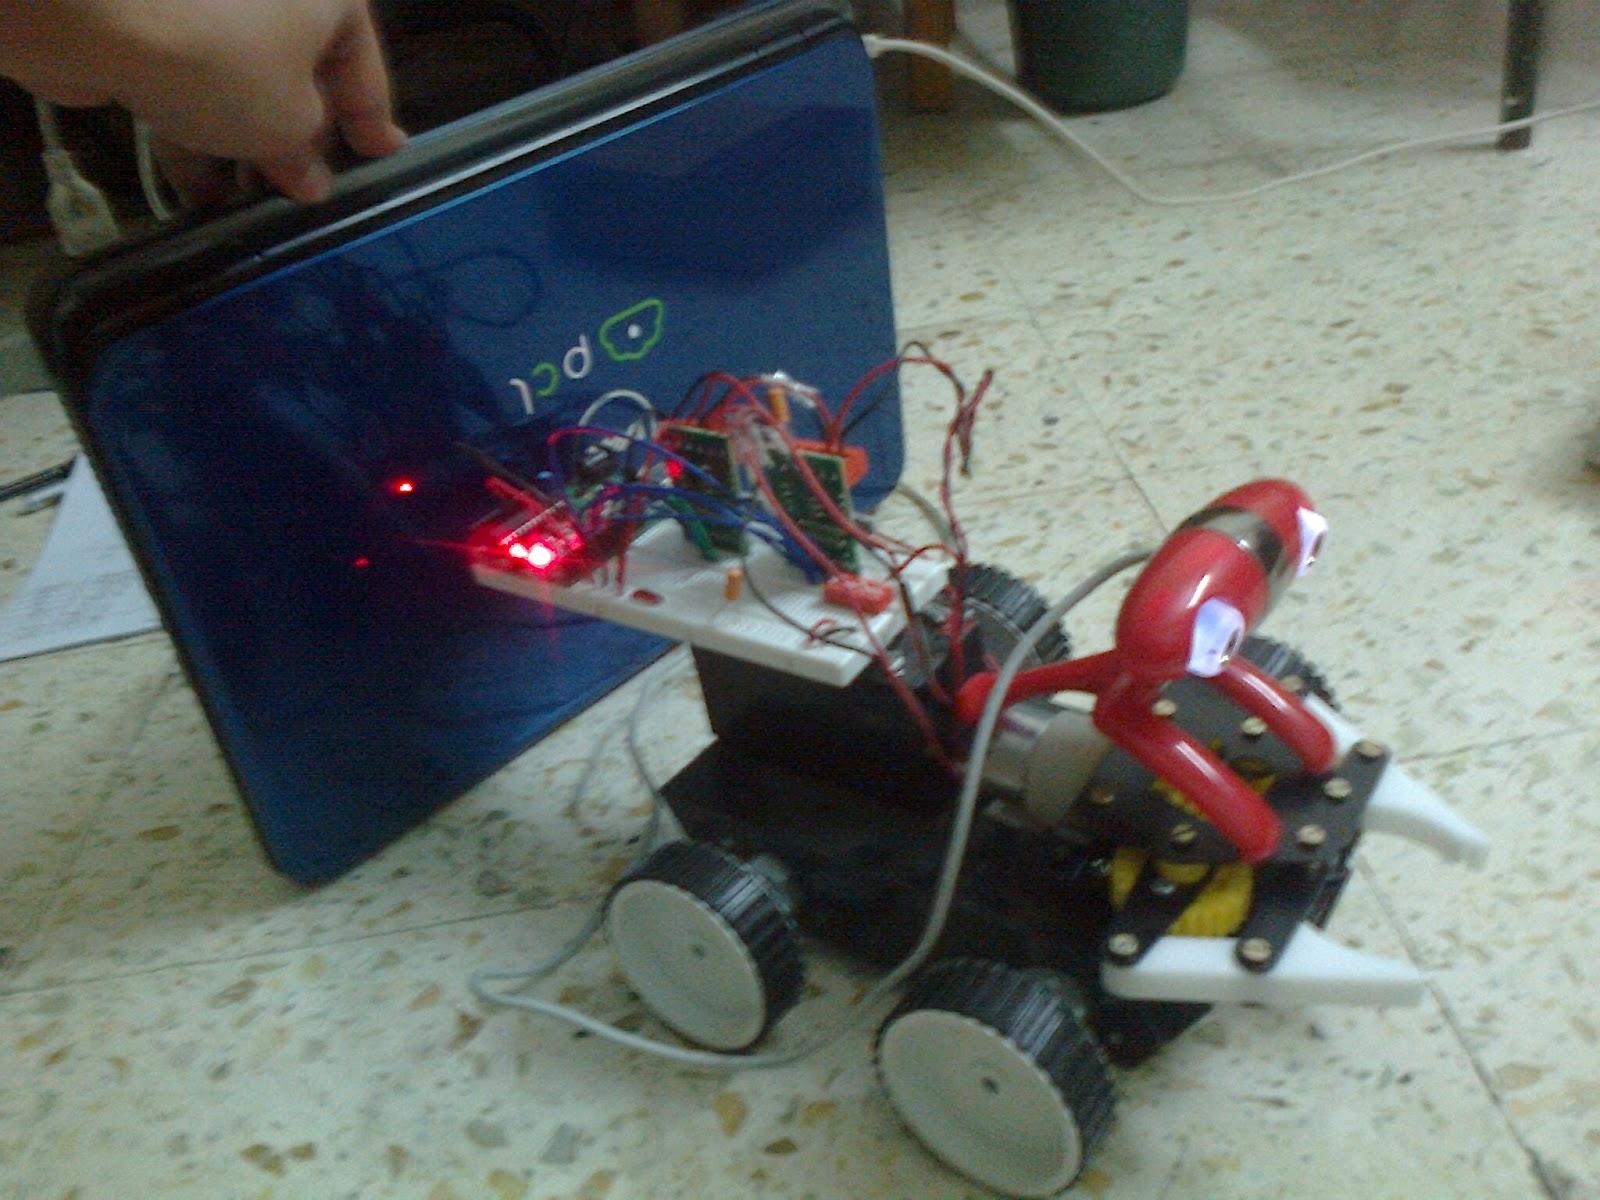 Robot control using OpenCV and Arduino | Computer Vision, Robotics